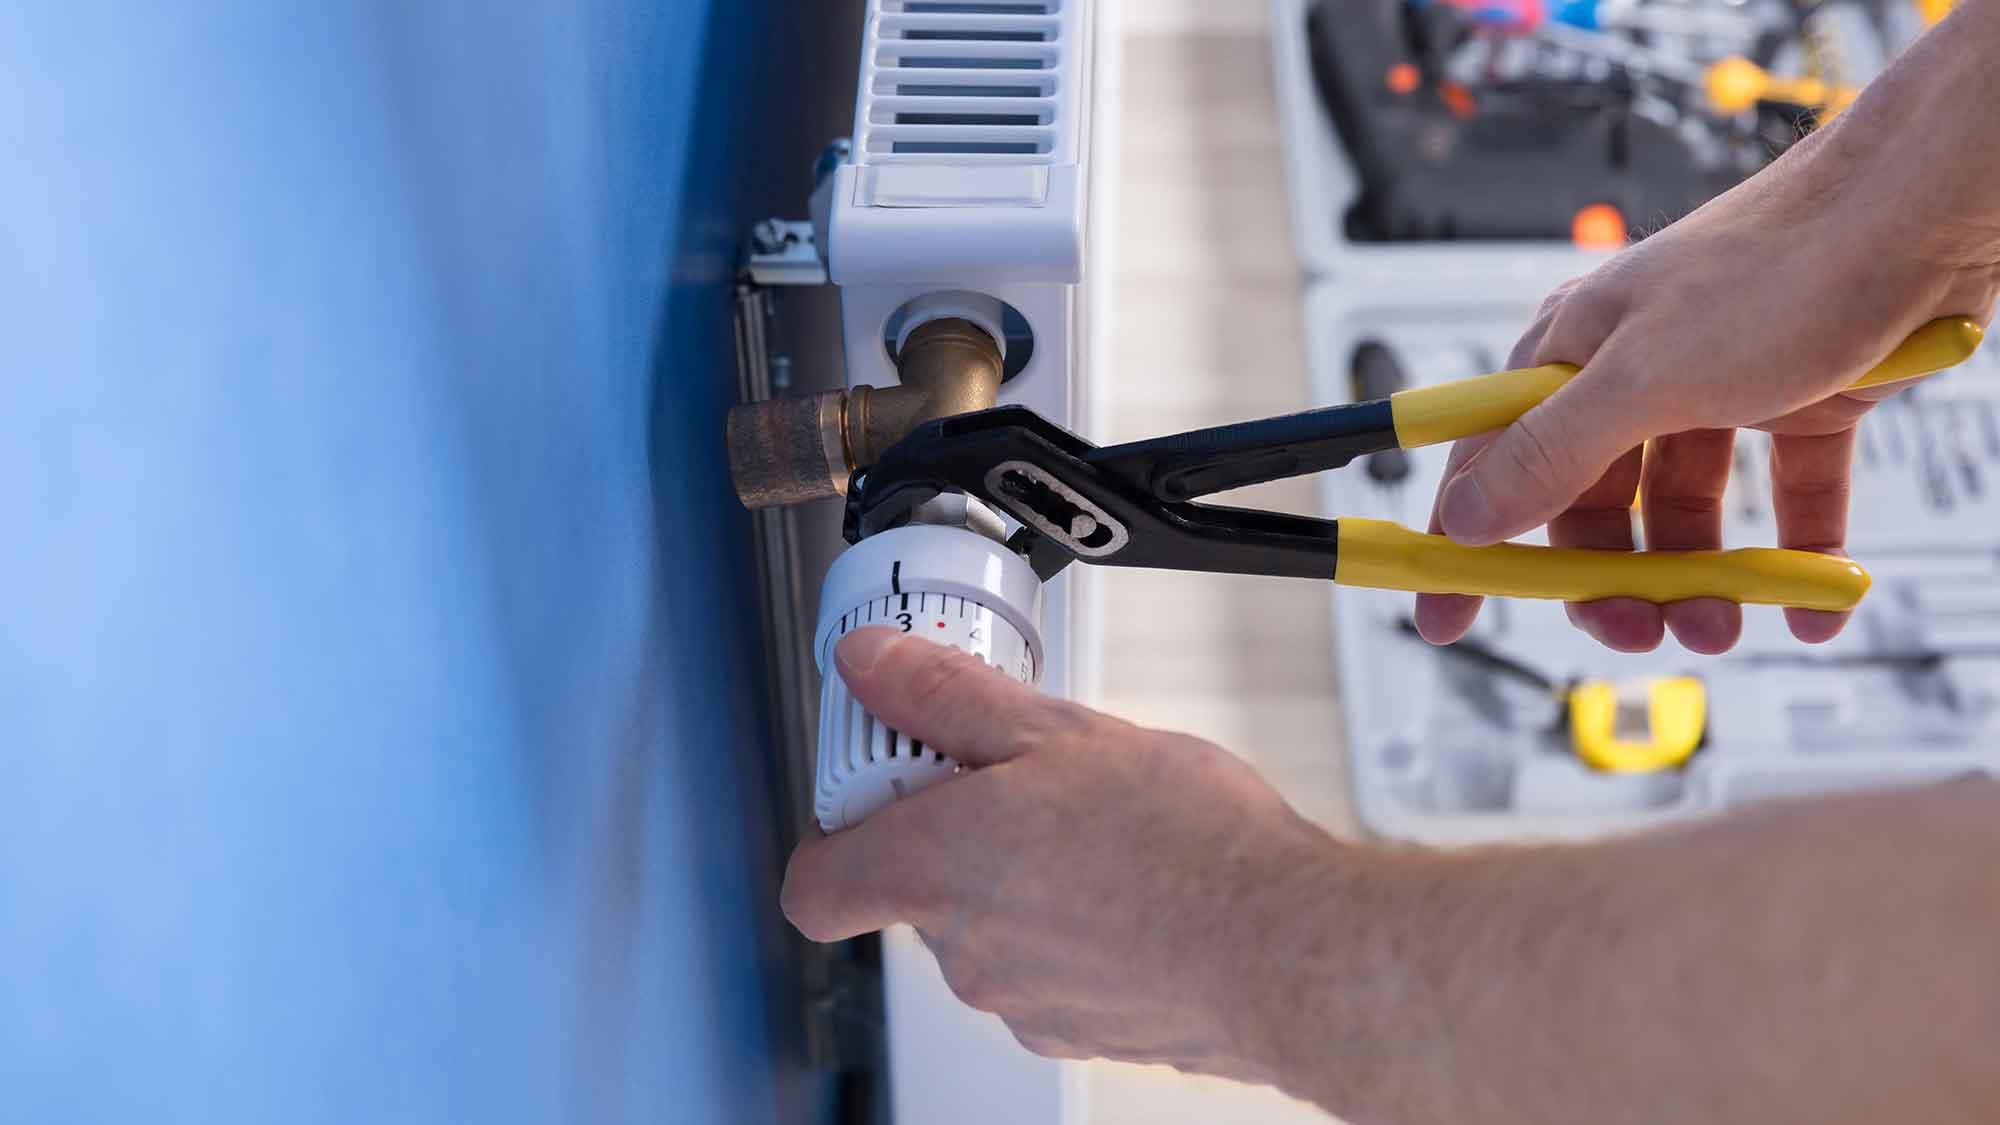 central heating repair essex maintenance leigh on sea radiator